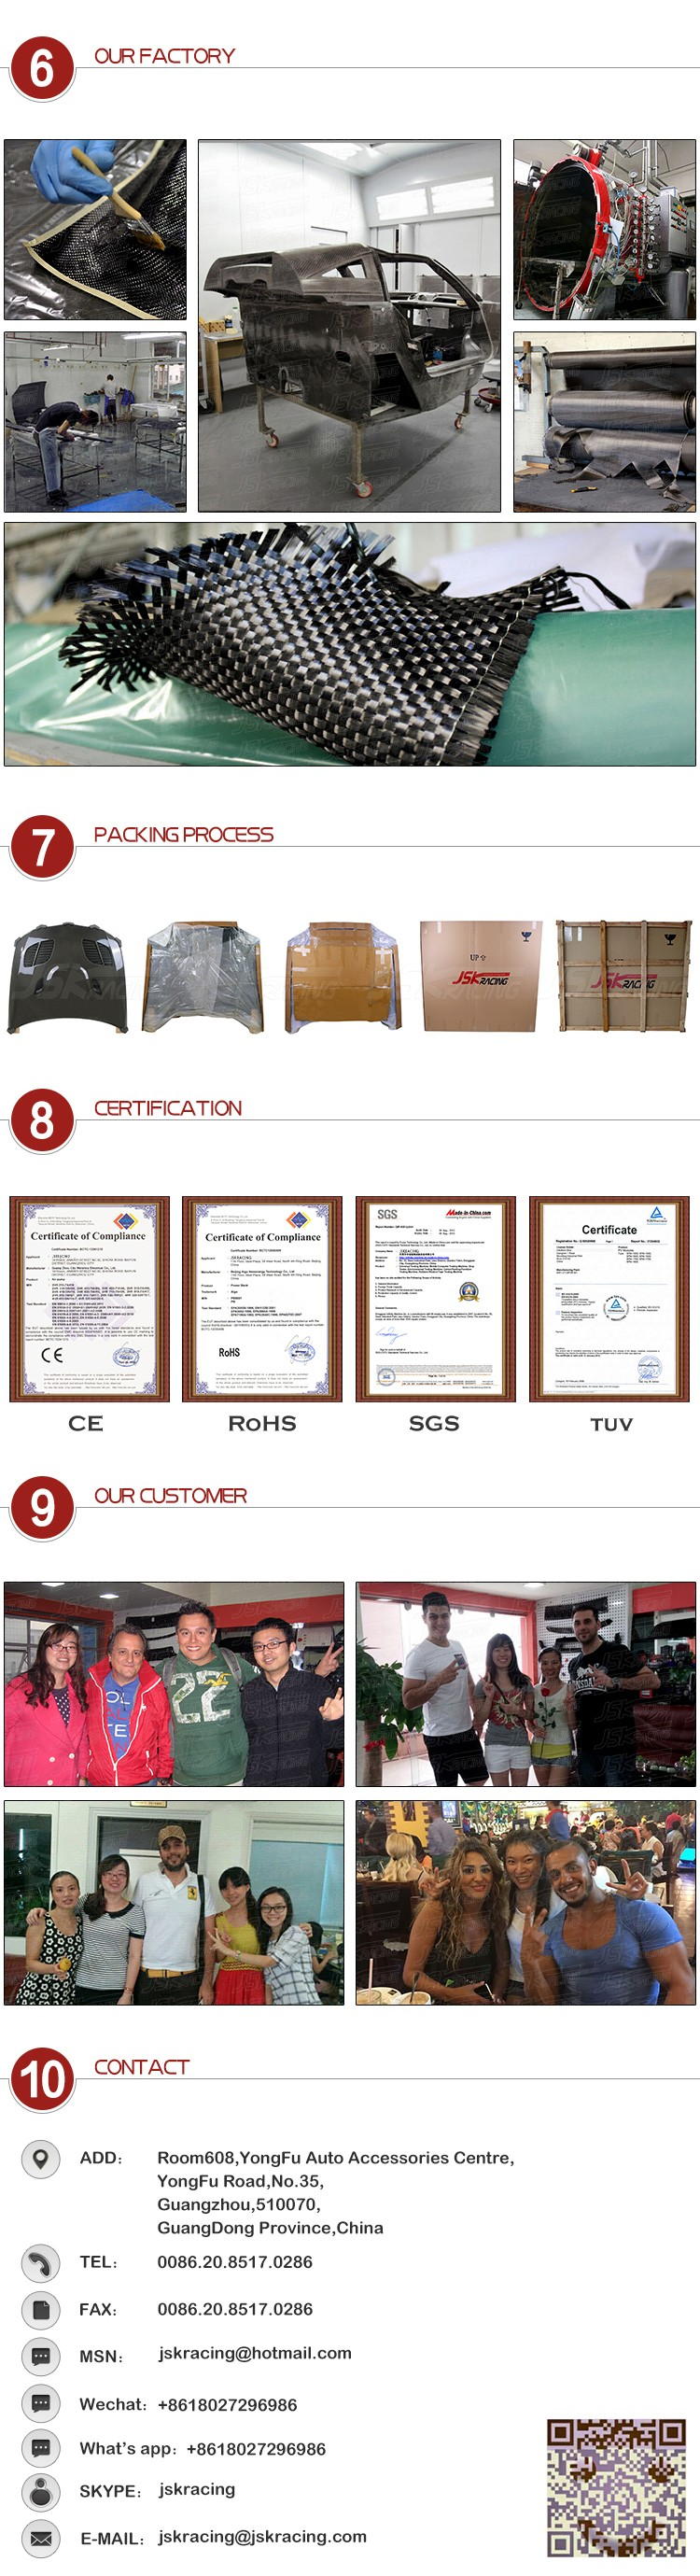 Alibaba manufacturer directory suppliers manufacturers dmax style carbon fiber vent bonnet hood for nissan skyline r32 gtr jsk220106 vanachro Gallery